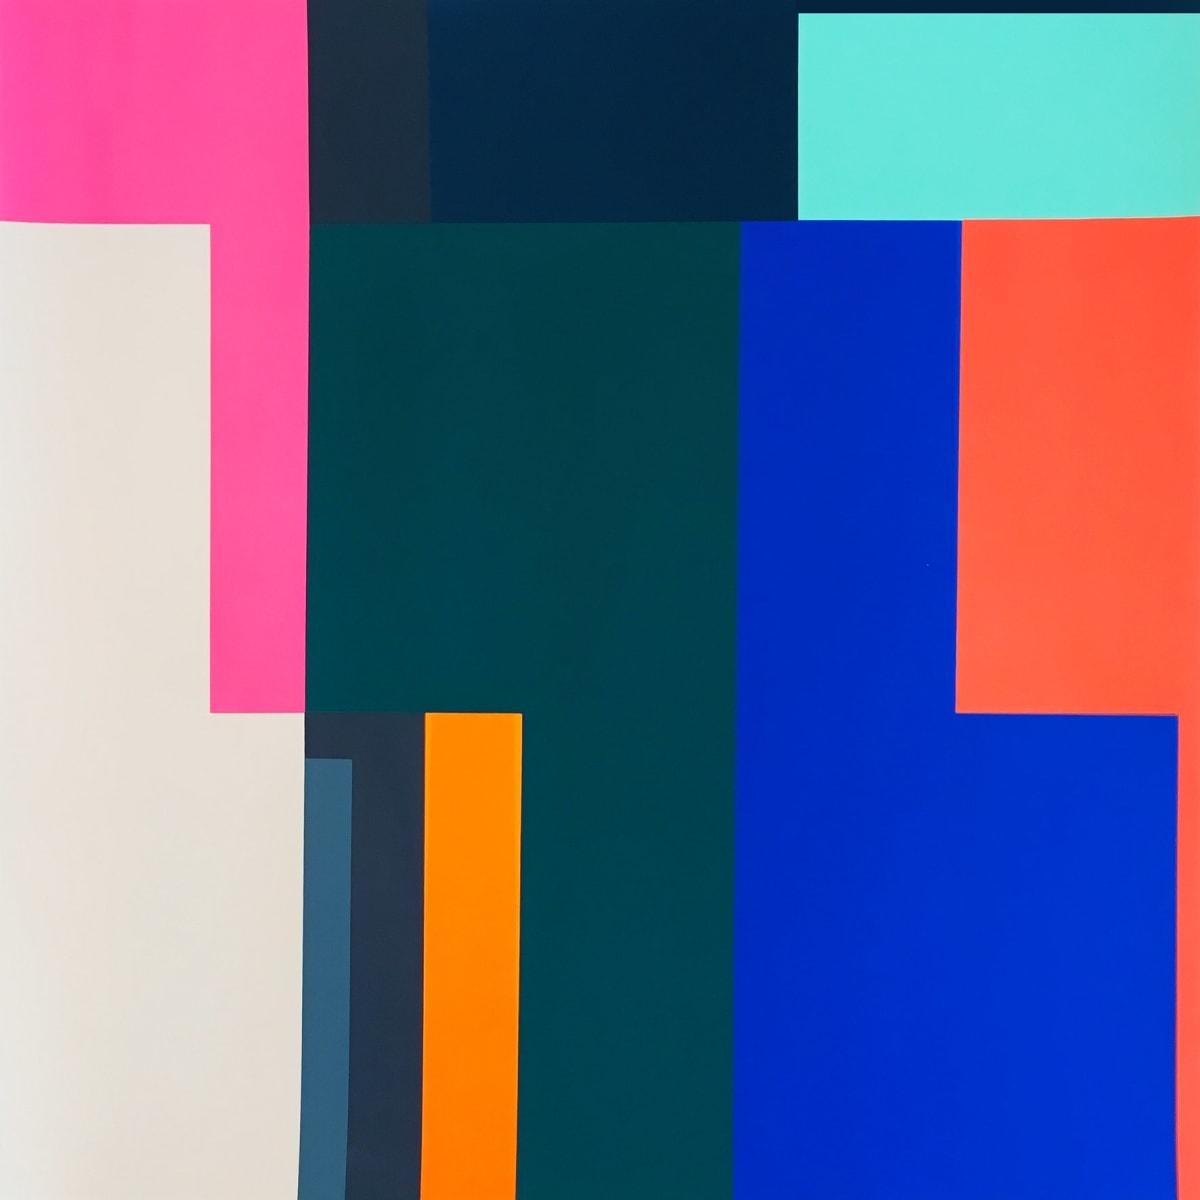 Frea Buckler Play, 2019 Unique screenprint on paper 90 x 90cm